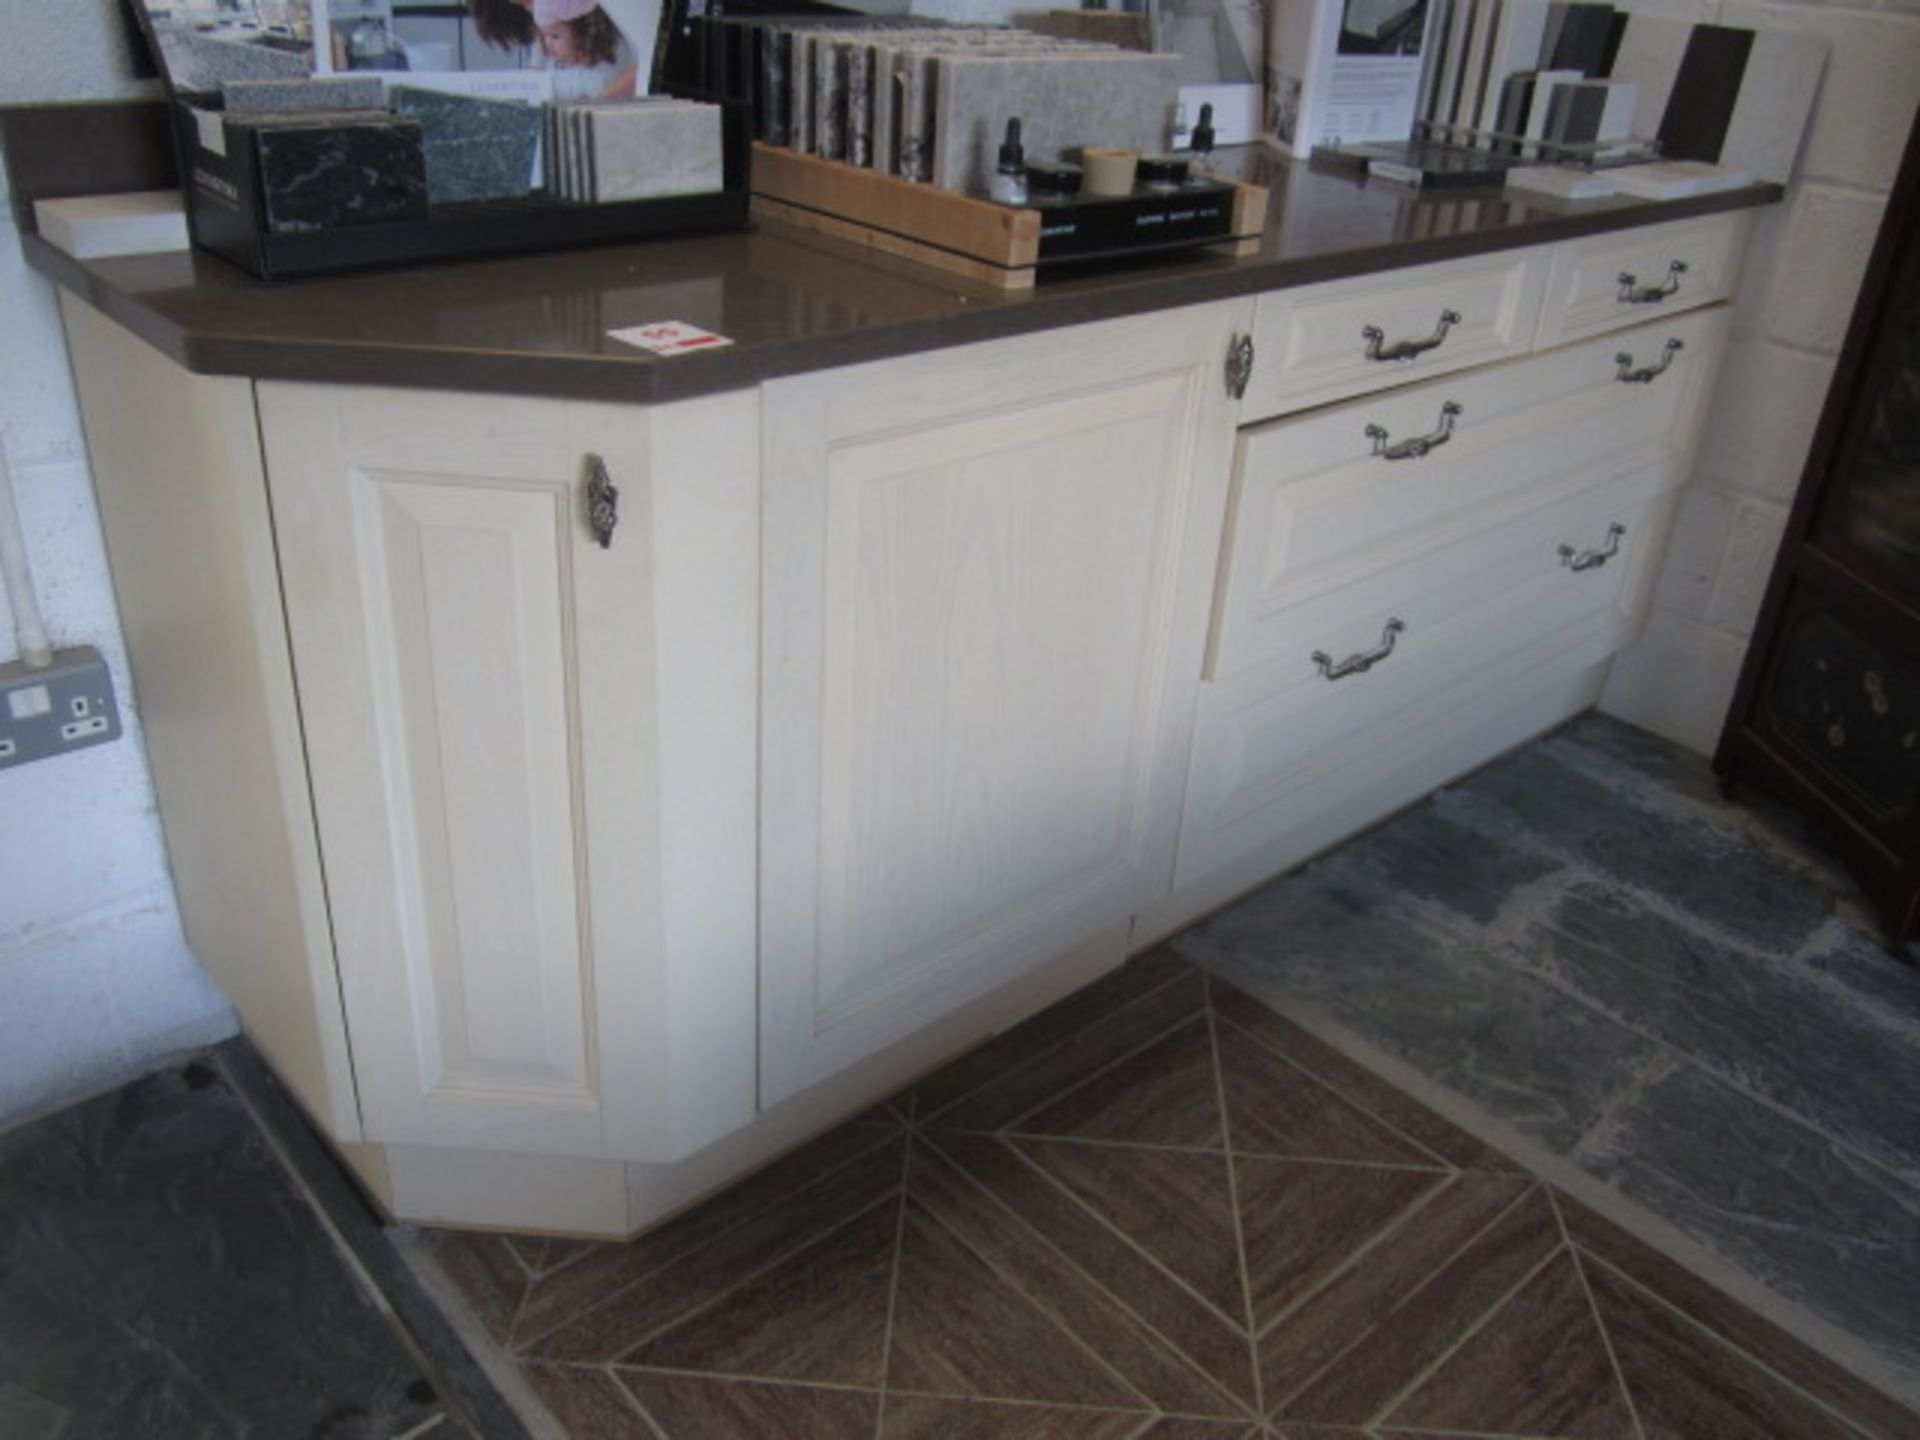 Lot 55 - Kitchen display comprising of 2 x pots & pan drawers, 2 x cutlery drawers, 1 x corner base unit, 1 x